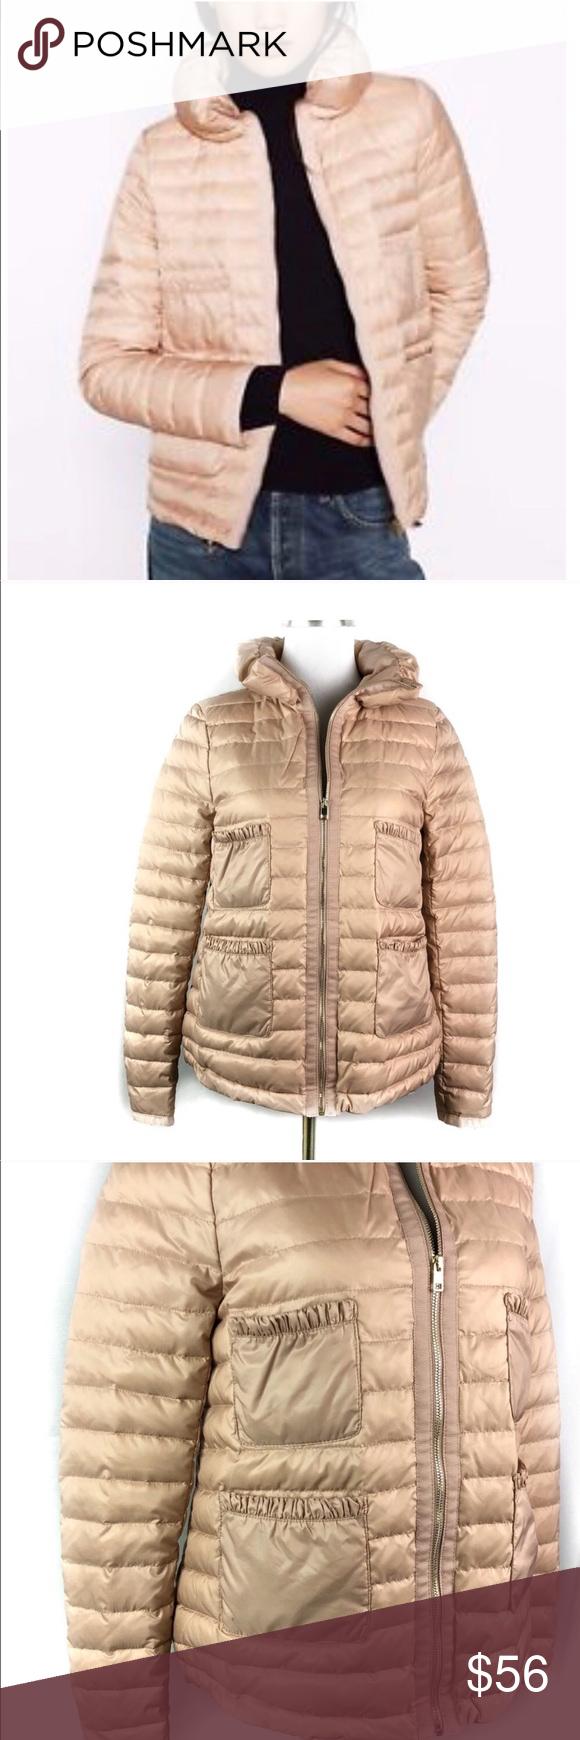 Zara Down Jacket Blush Pink Quilted Puffer Winter Pink Puffer Coat Zara Women Zara [ 1740 x 580 Pixel ]